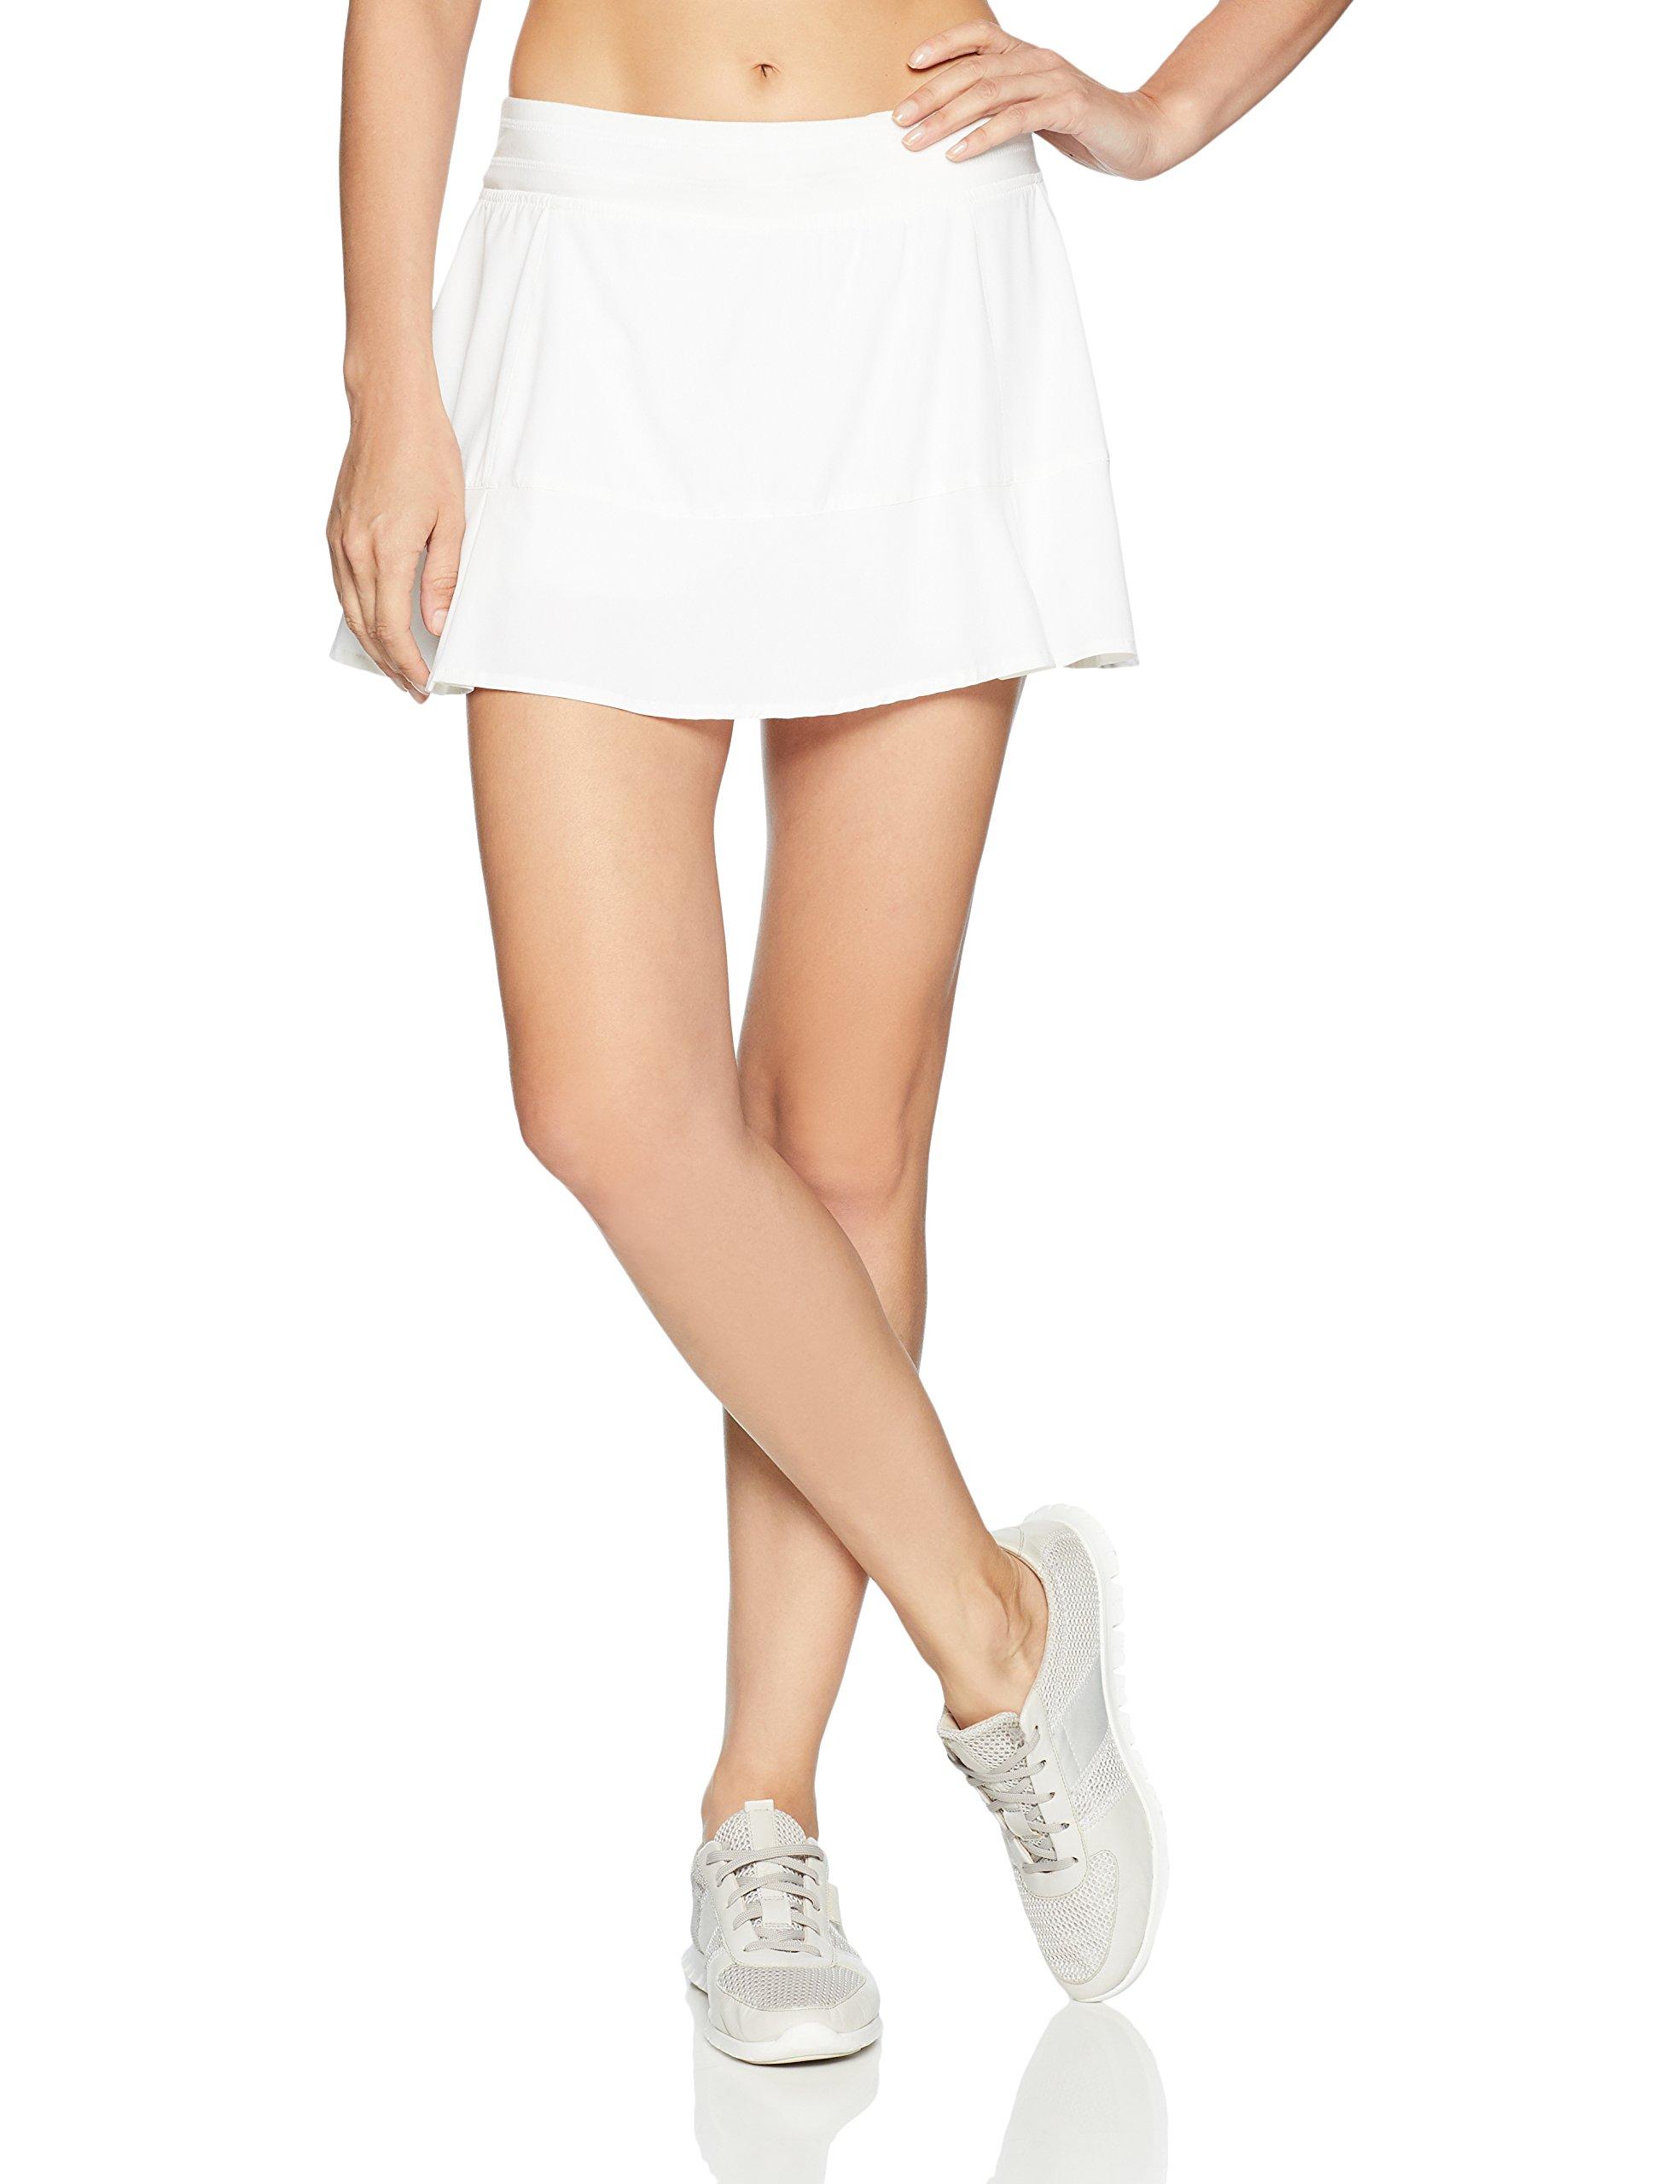 tasc Performance Rhythm Skirt, White, X-Large by tasc Performance